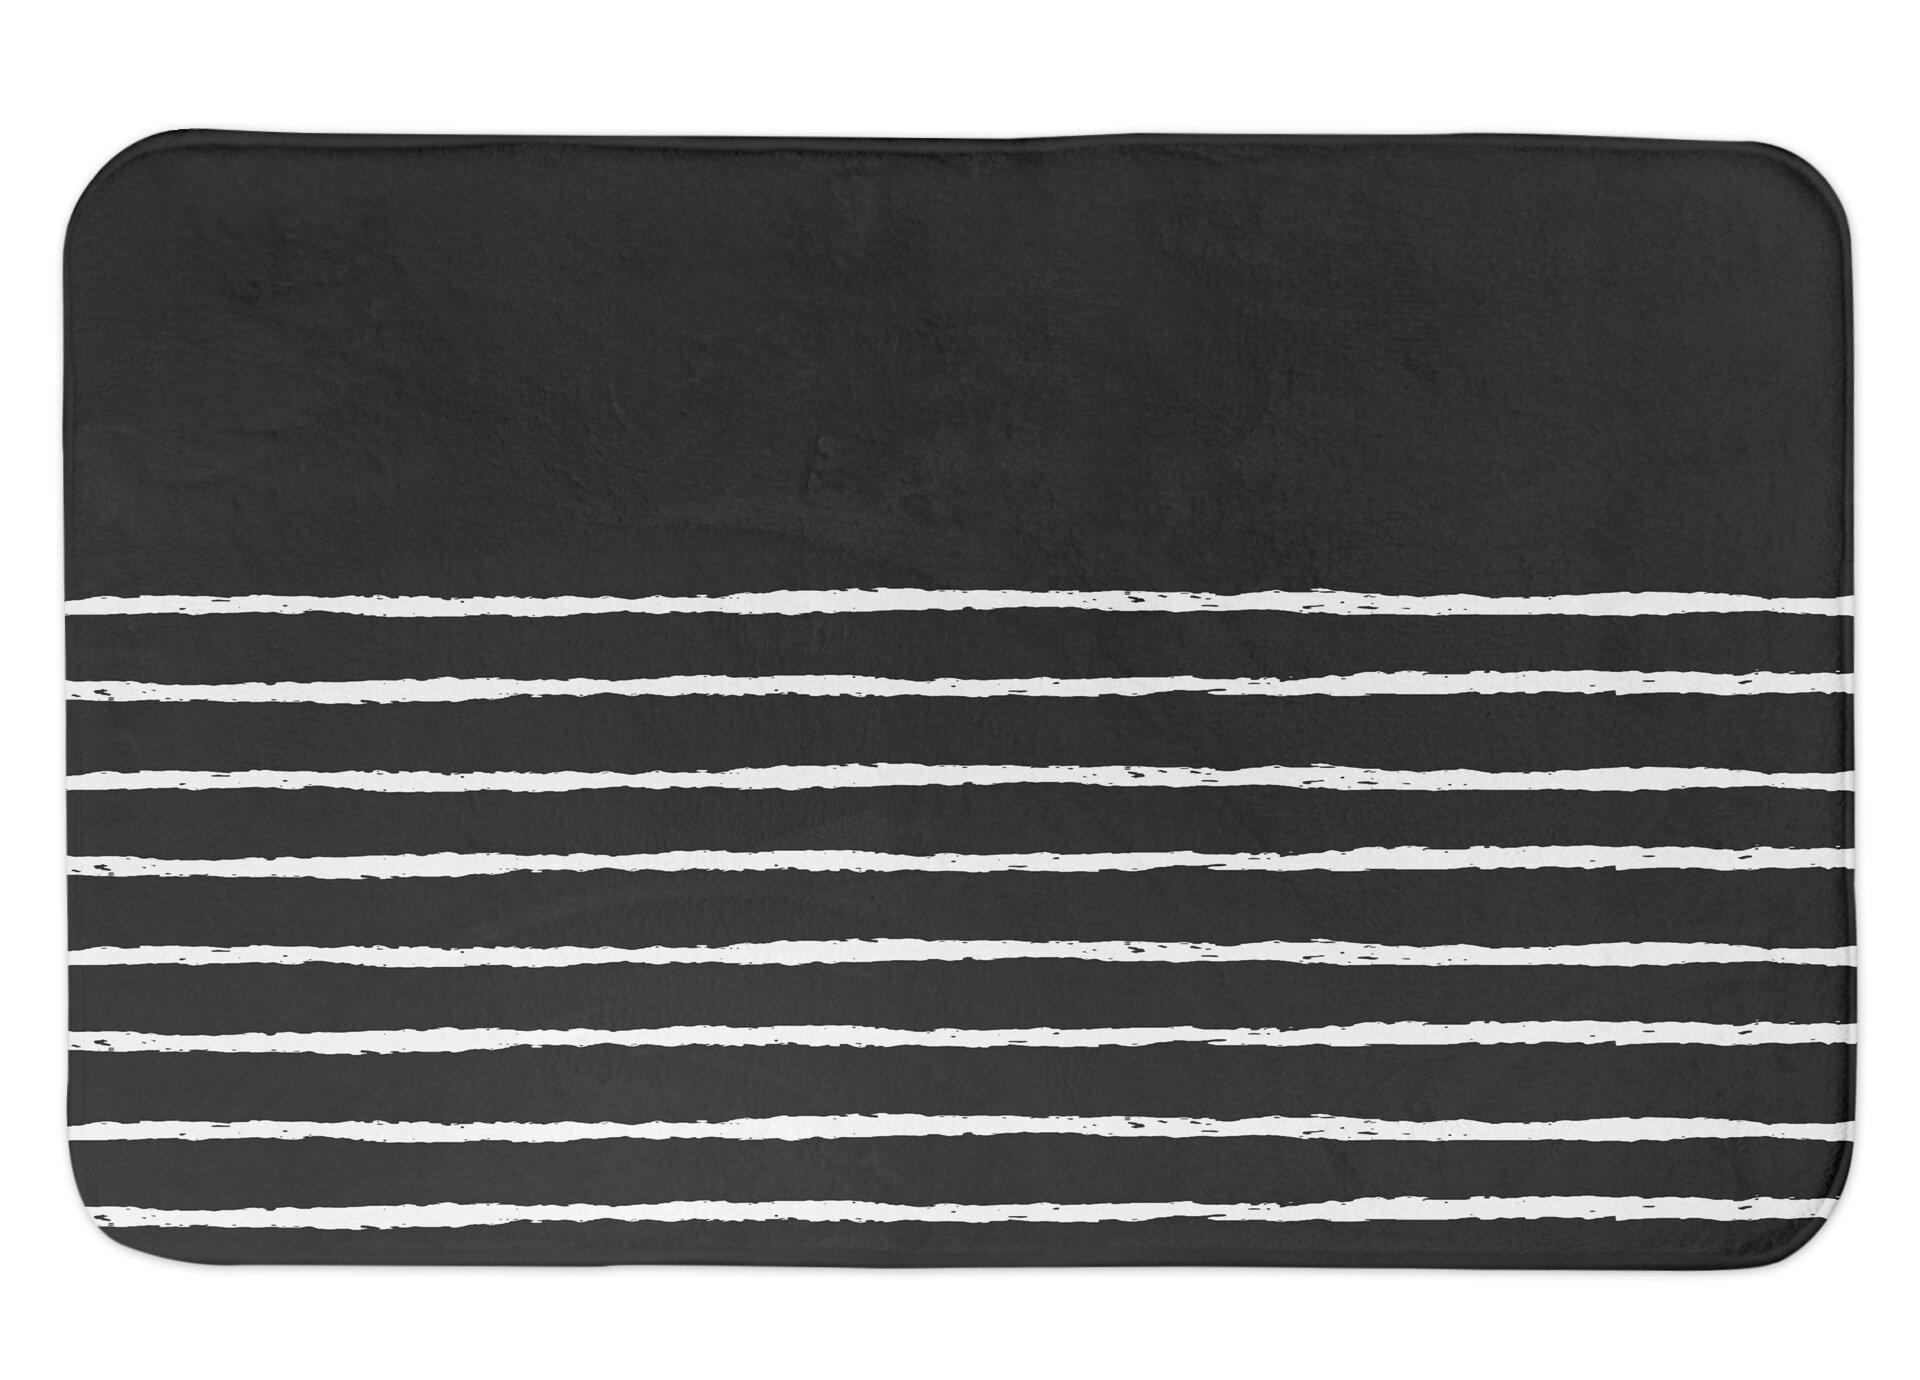 Orren Ellis Stasya Sketch Stripes Rectangle Non Slip Striped Bath Rug Reviews